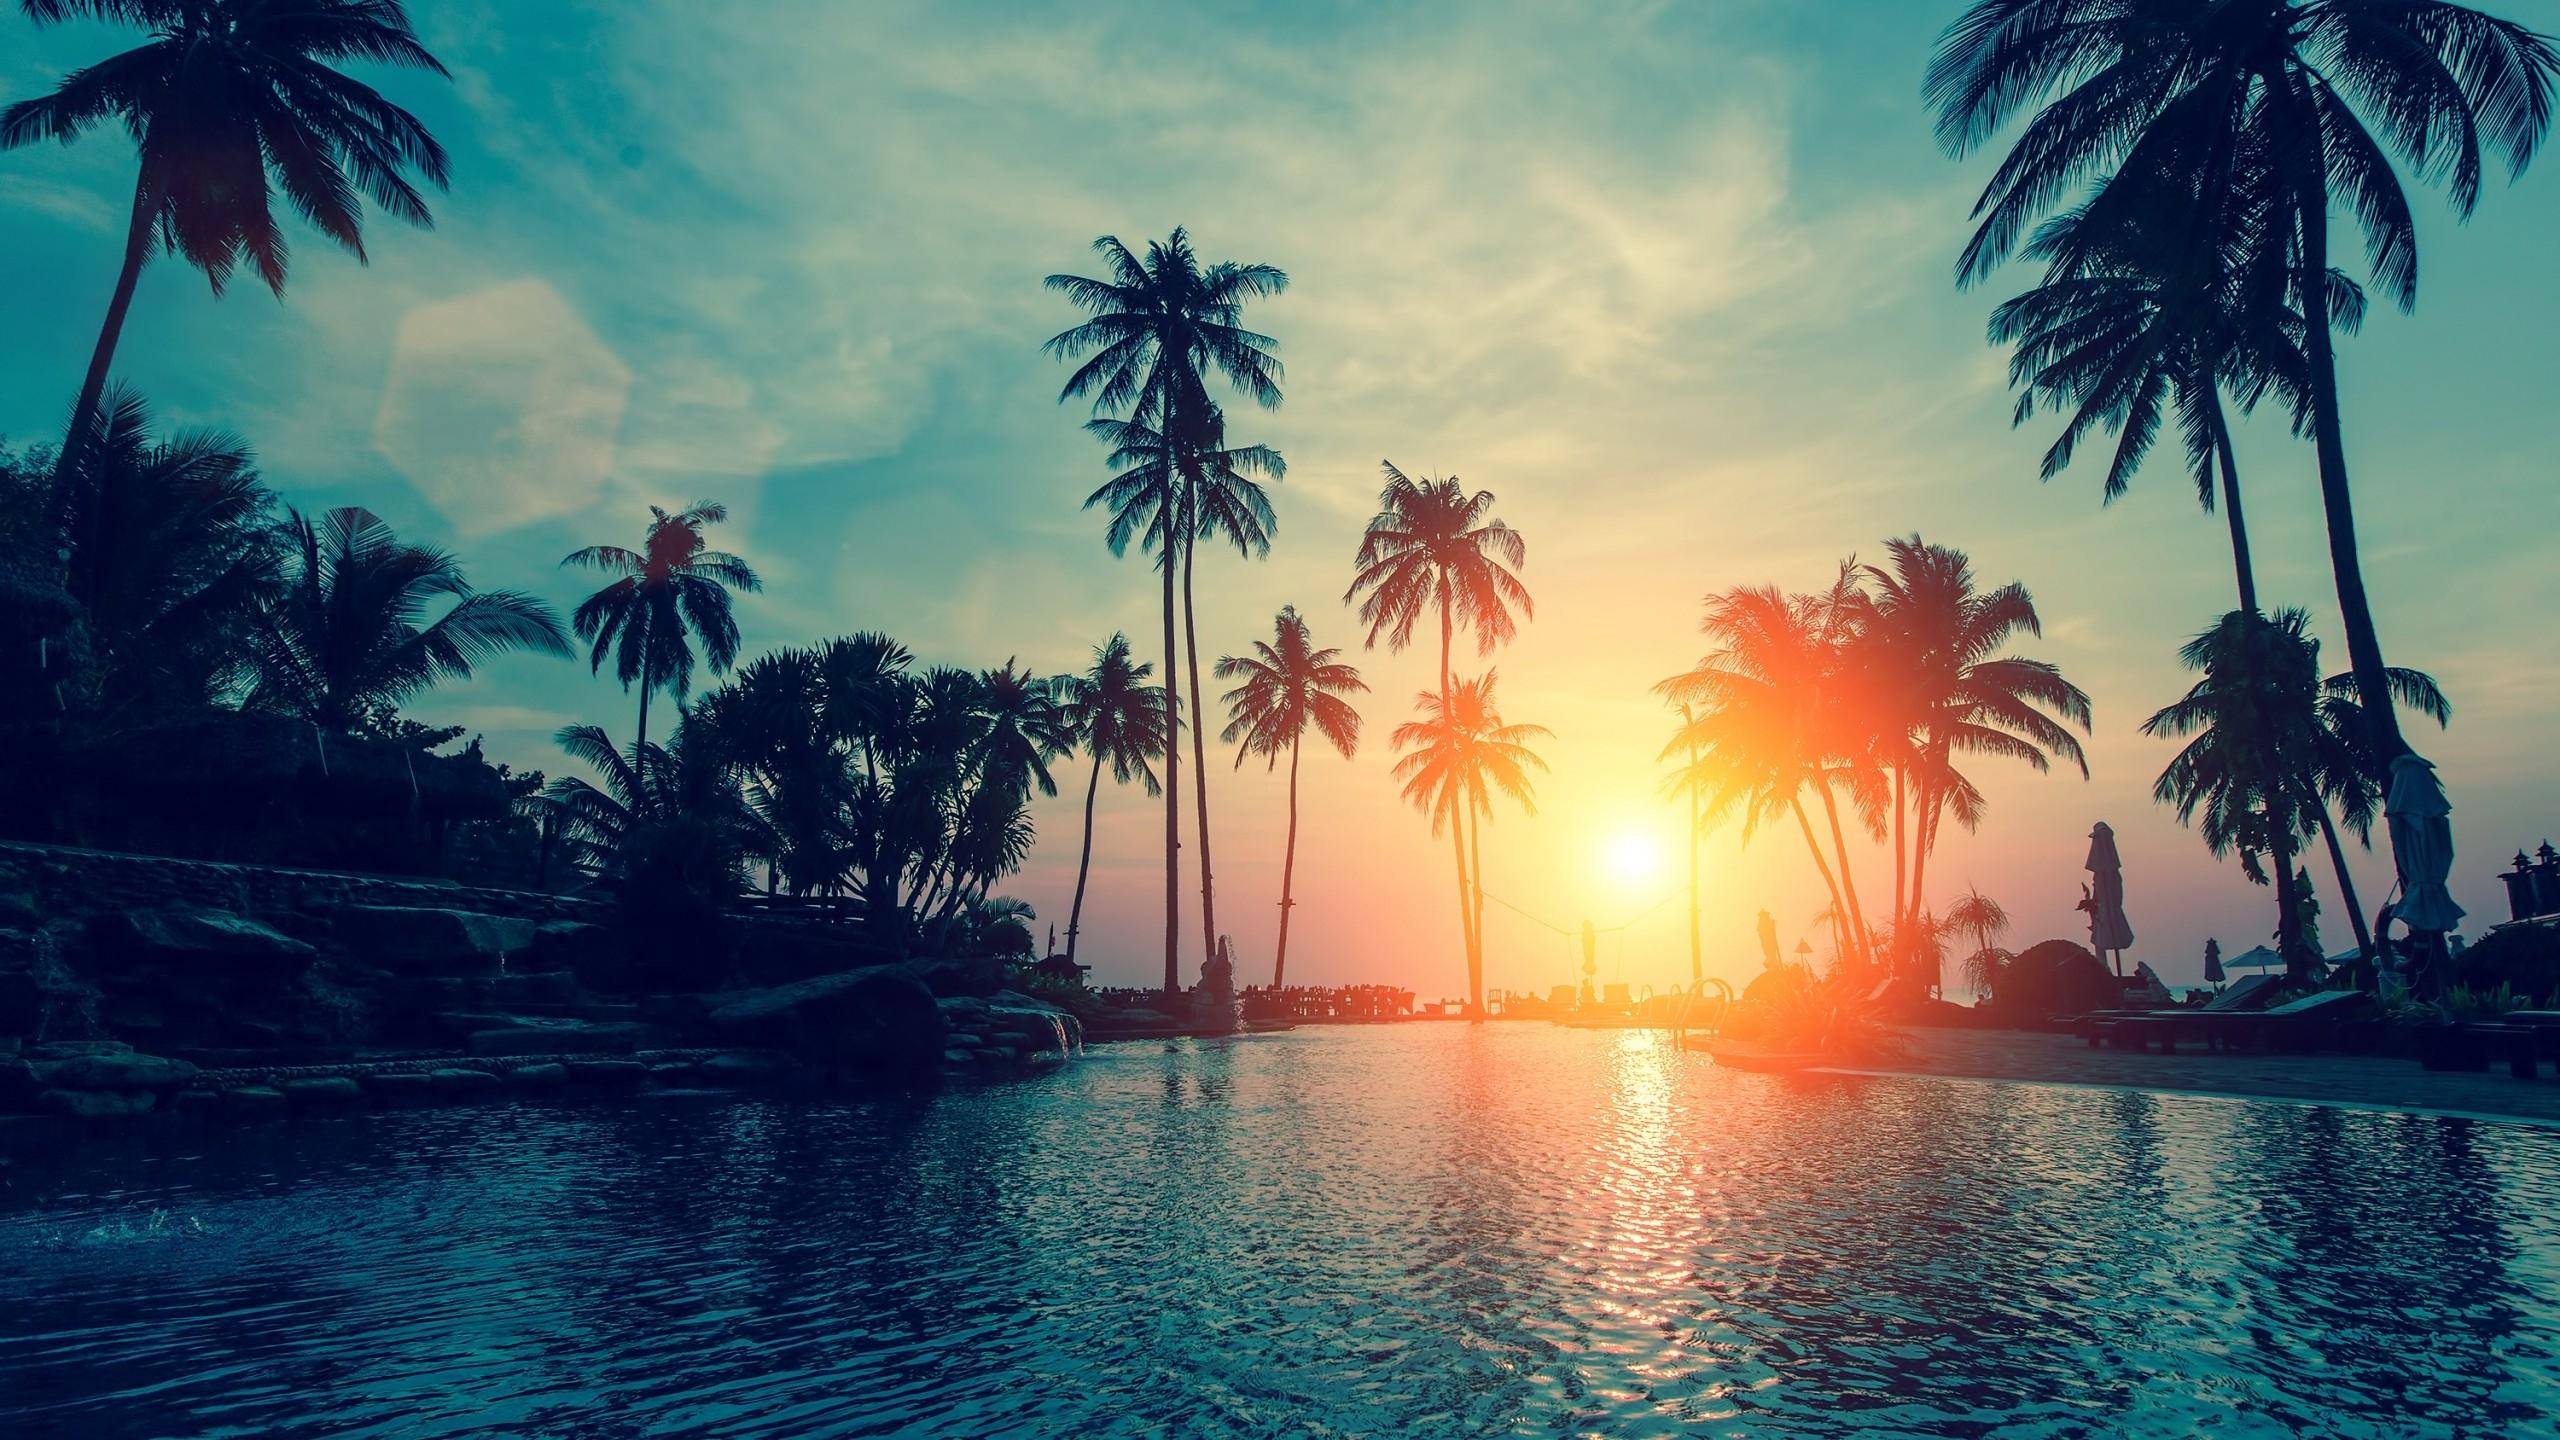 wallpaper sunset, palm trees, tropical beach, hd, nature, #6500